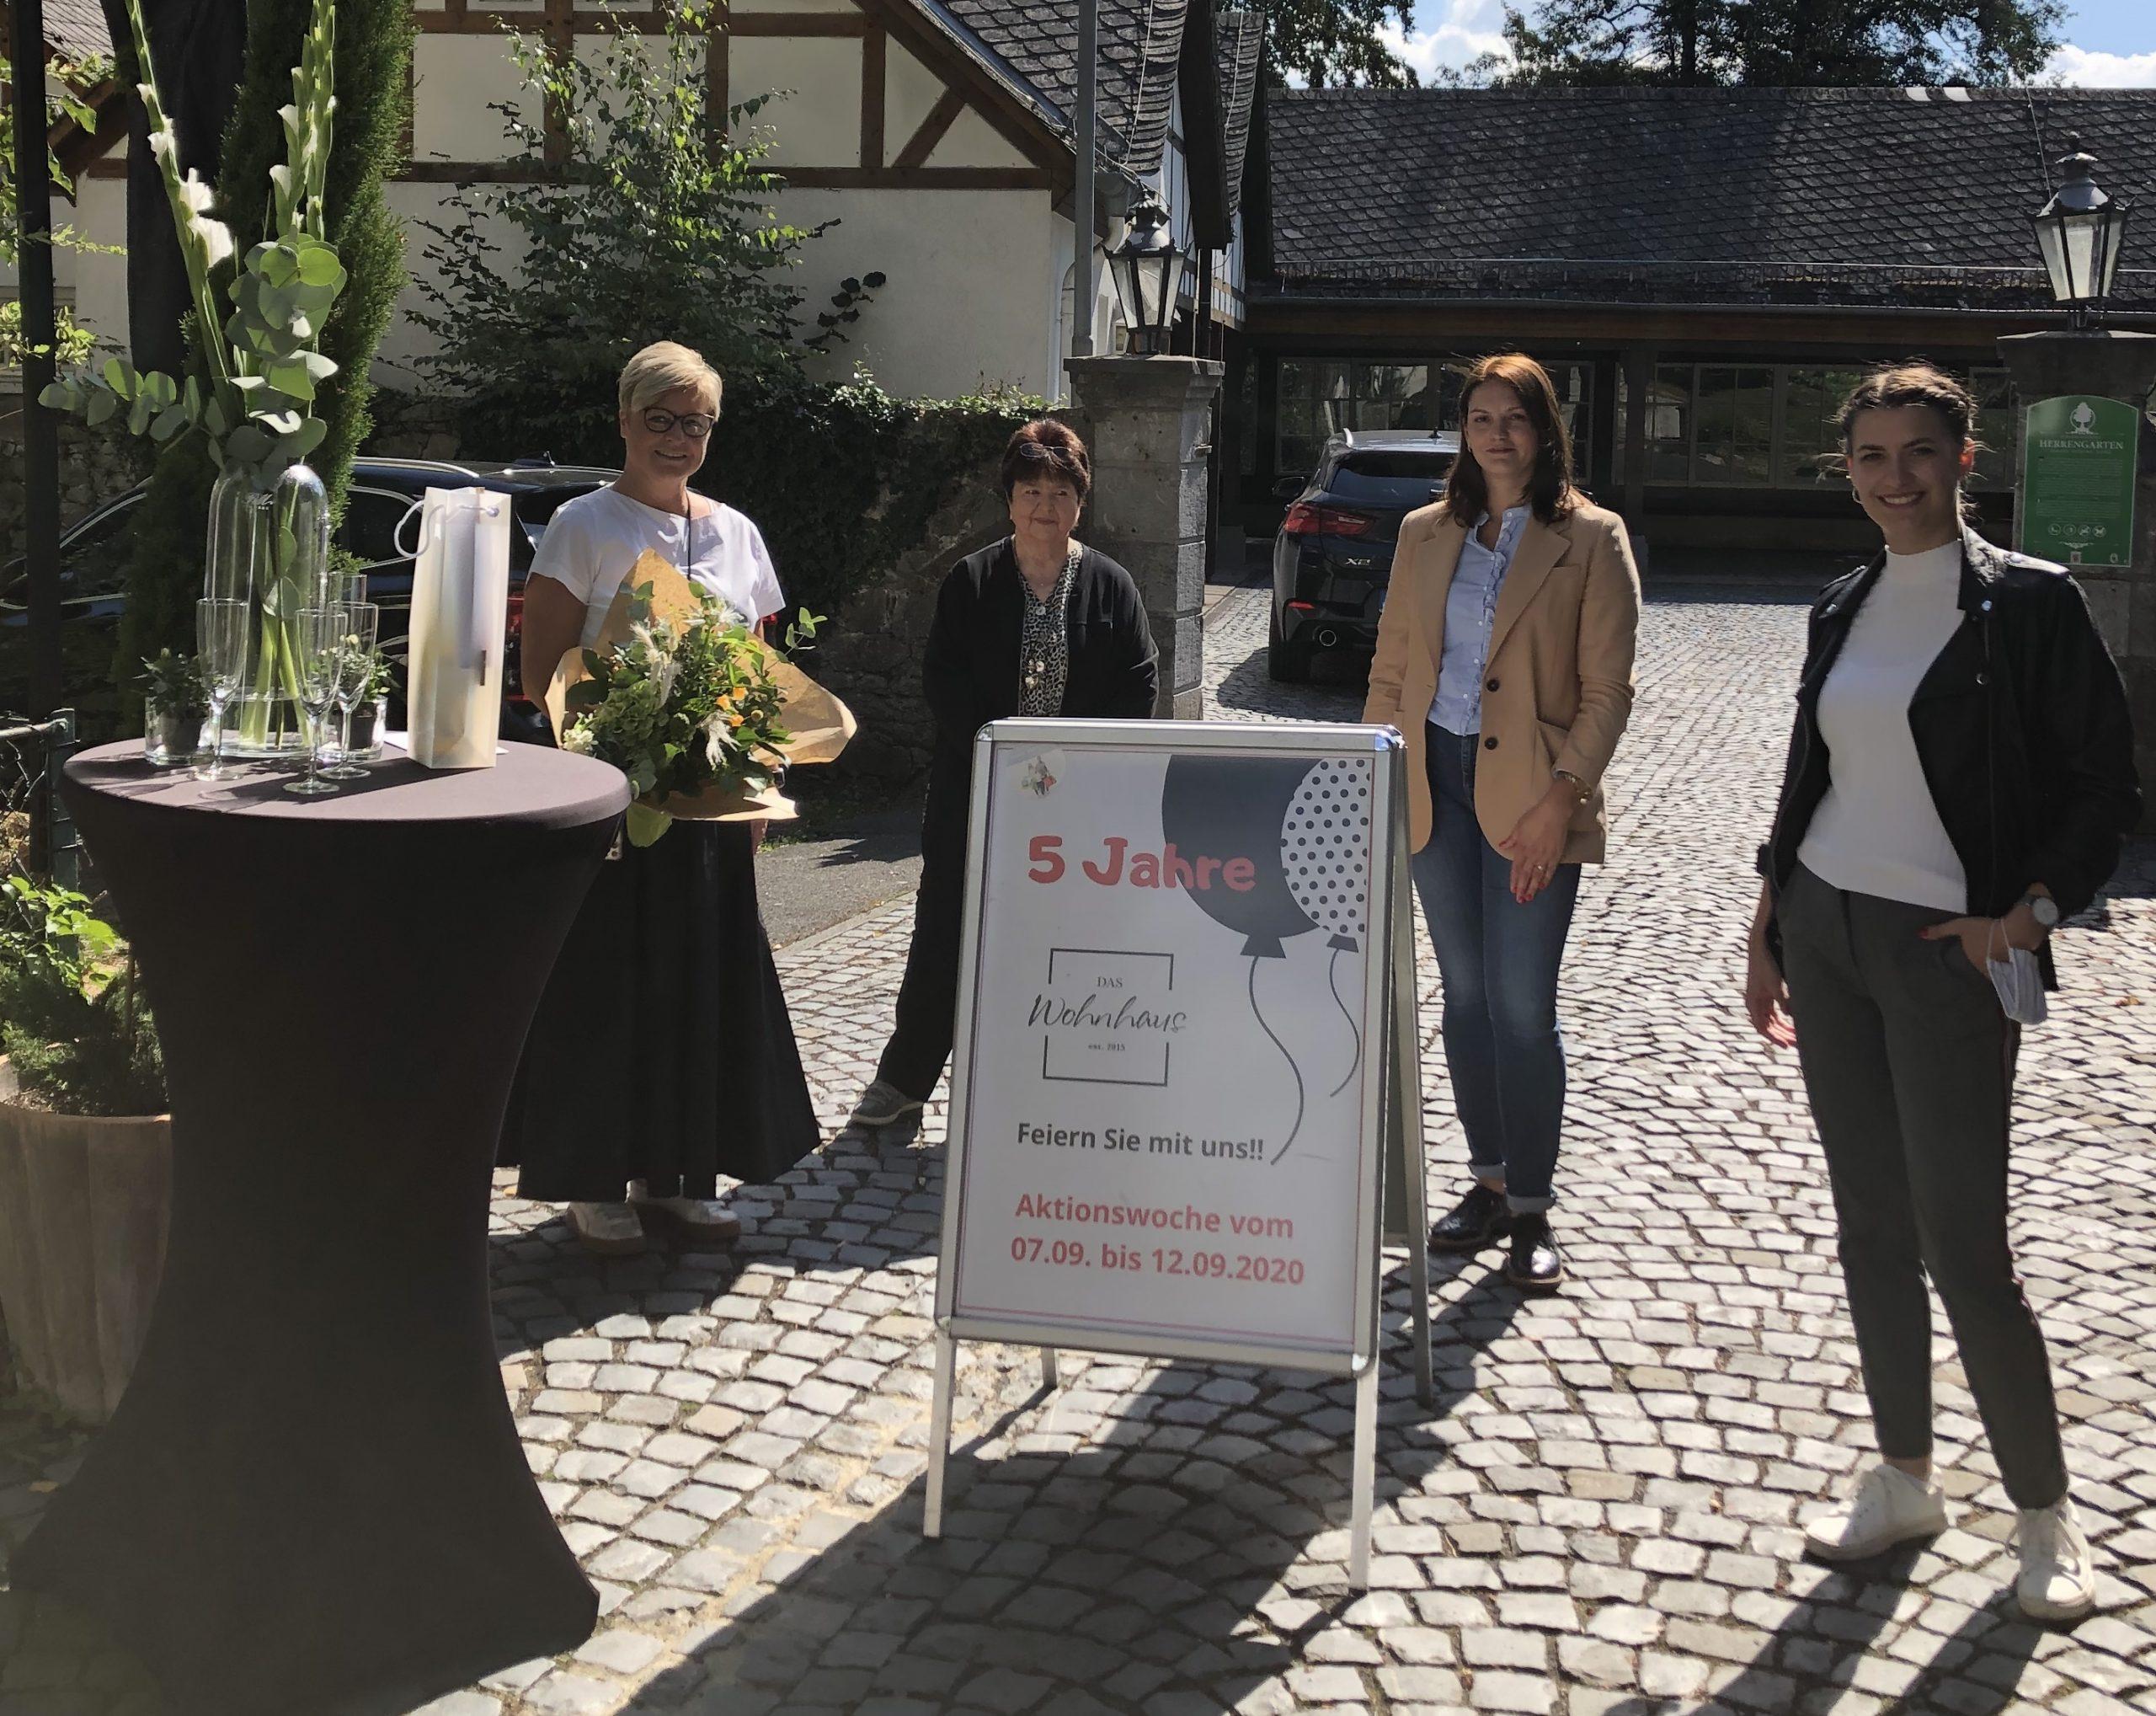 Von rechts: Dana Hochfeld (Braunfelser Kur GmbH), Viktoria Knaus, Elke Schütz (Interessengemeinschaft der Braunfelser Gewerbetreibenden) gratulieren REgina Andermann zum fünfjährigen Jubiläum.